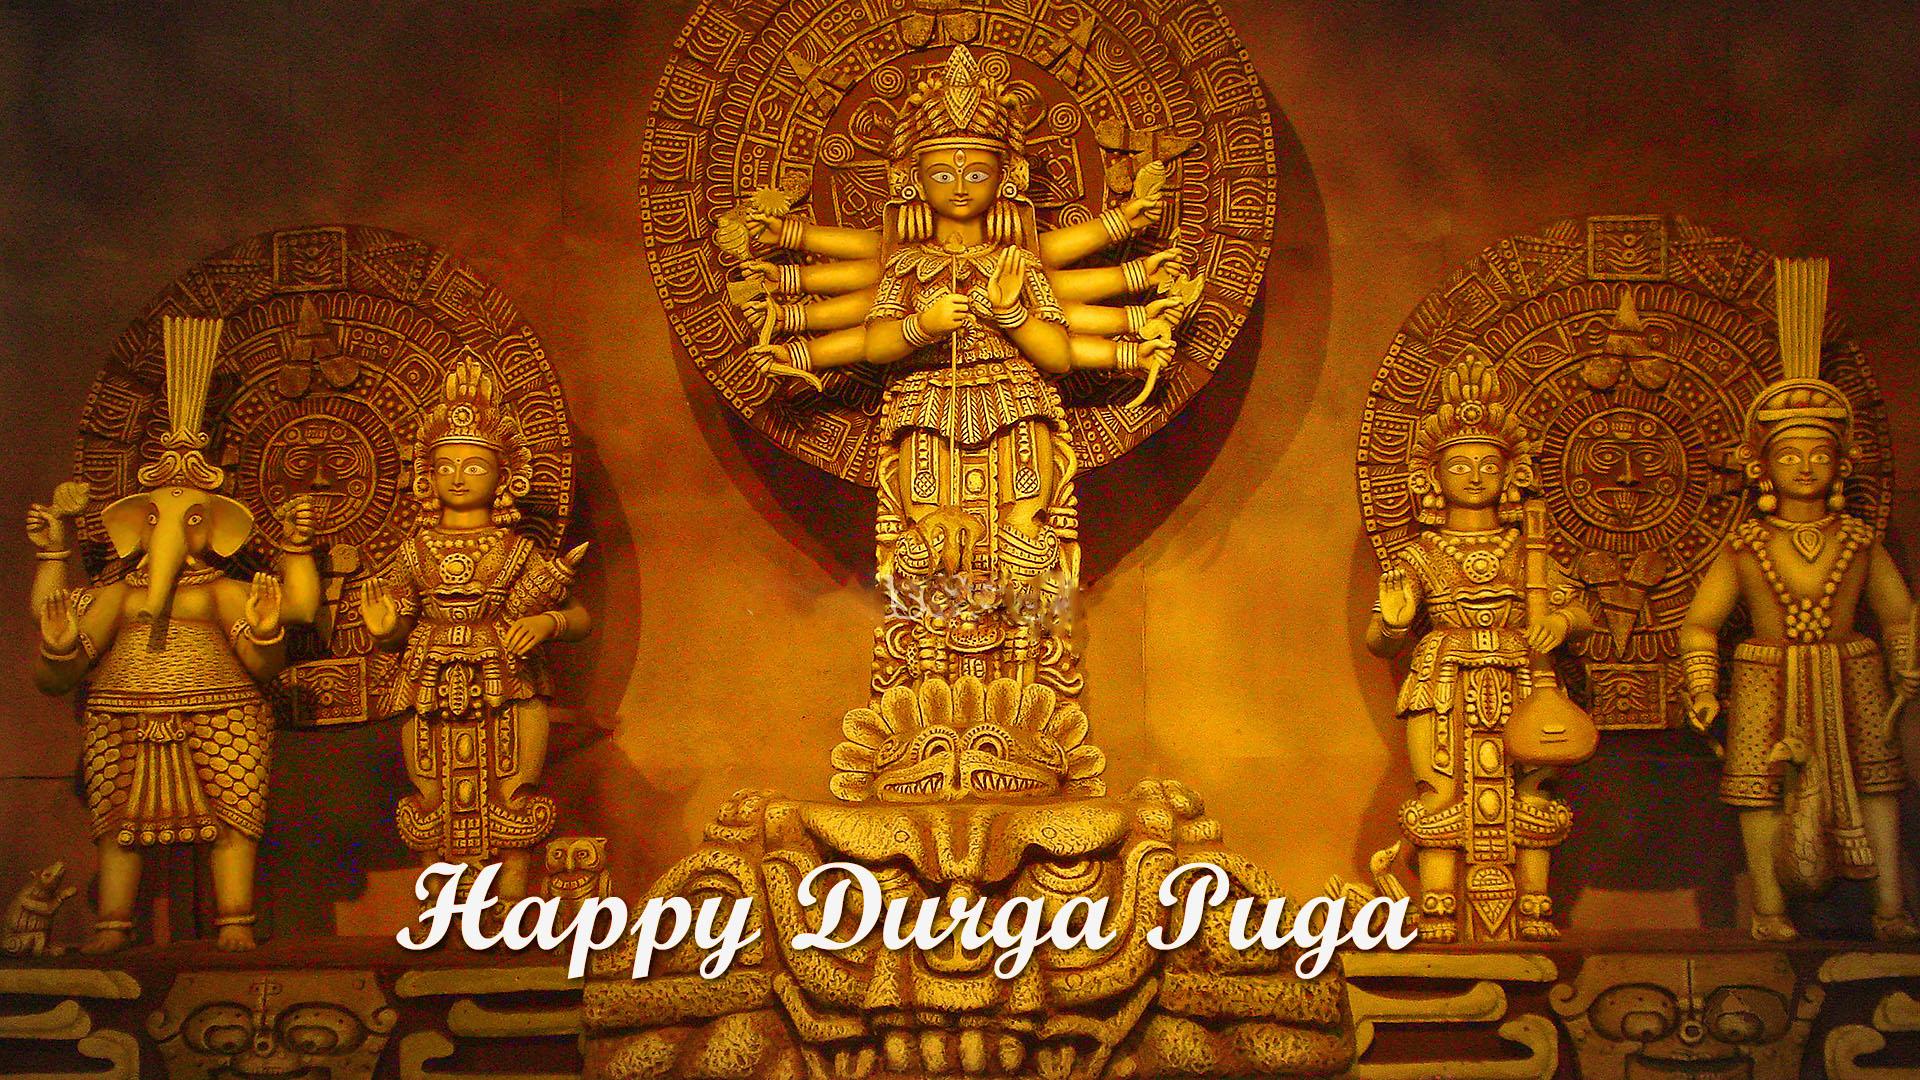 Durga Puja Images Download